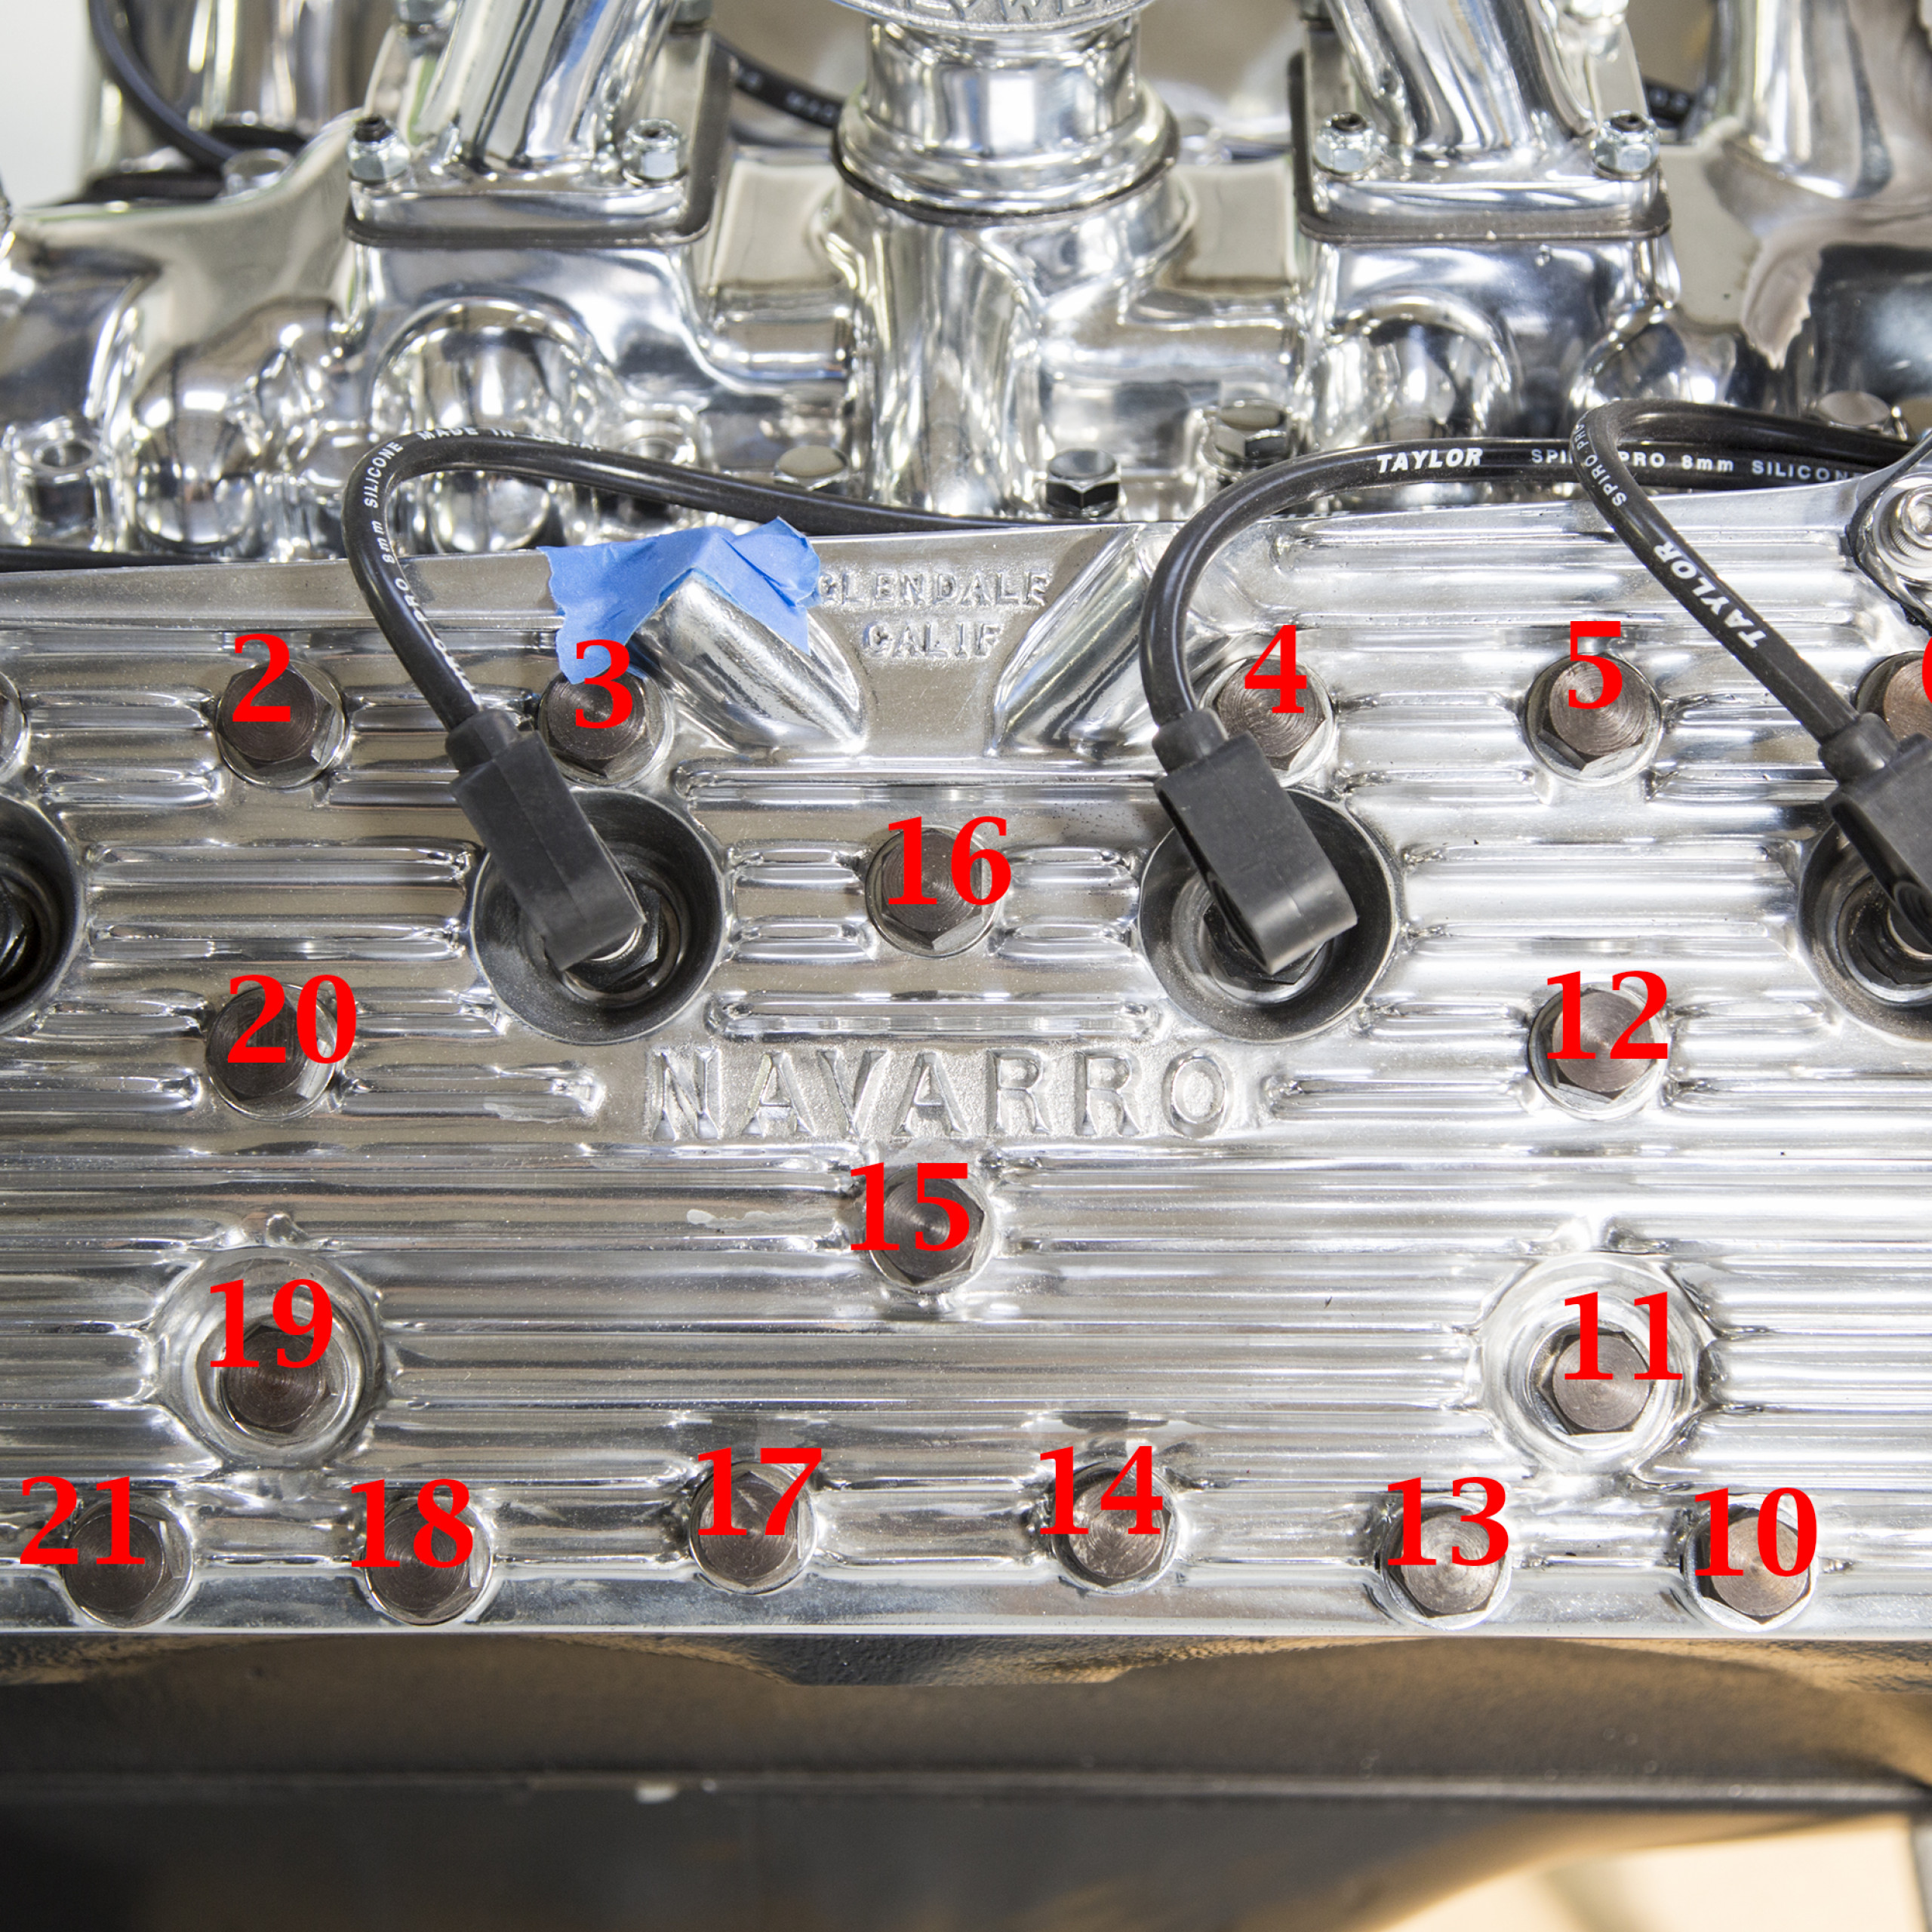 Bs_3401] Flathead Ford Firing Order Diagram On 1936 Ford V8